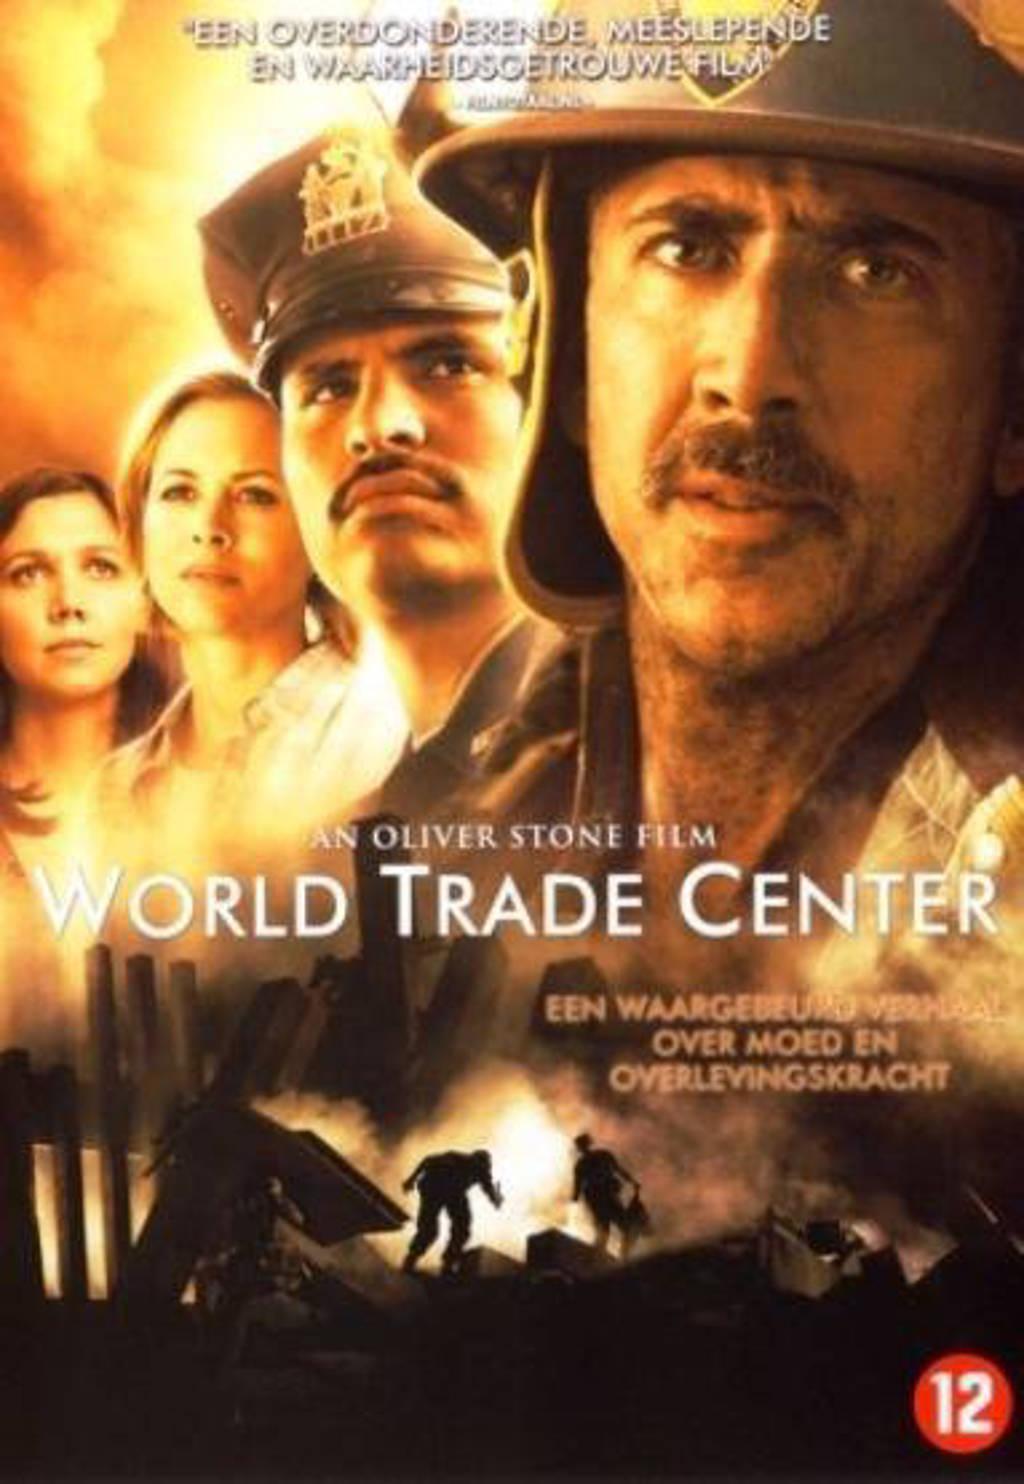 World trade center (DVD)